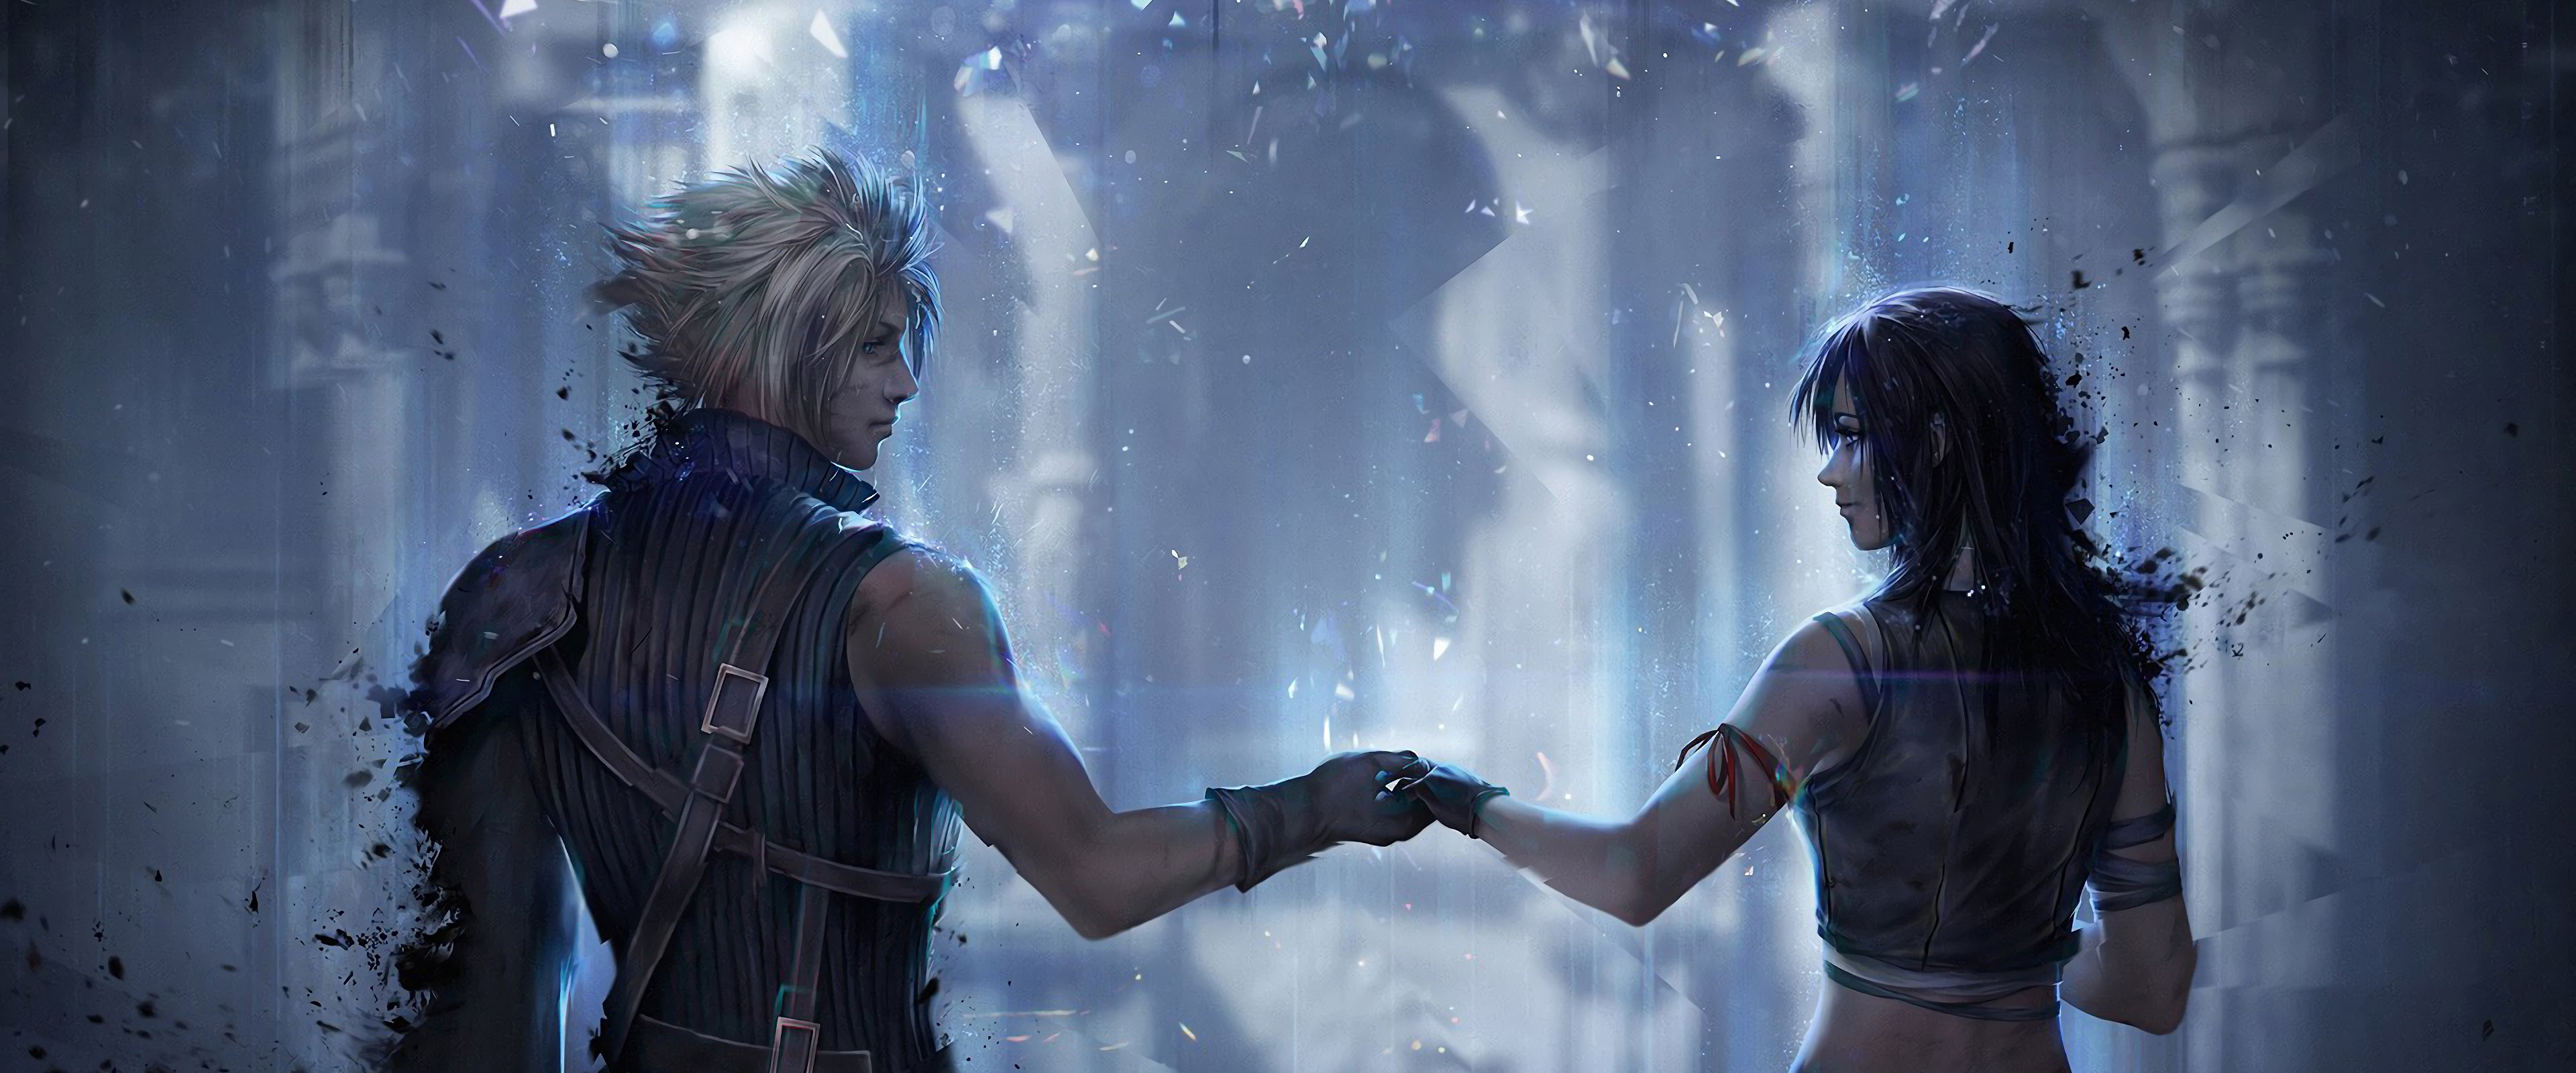 Cloud Strife Tifa Lockhart Final Fantasy 7 Remake 4K